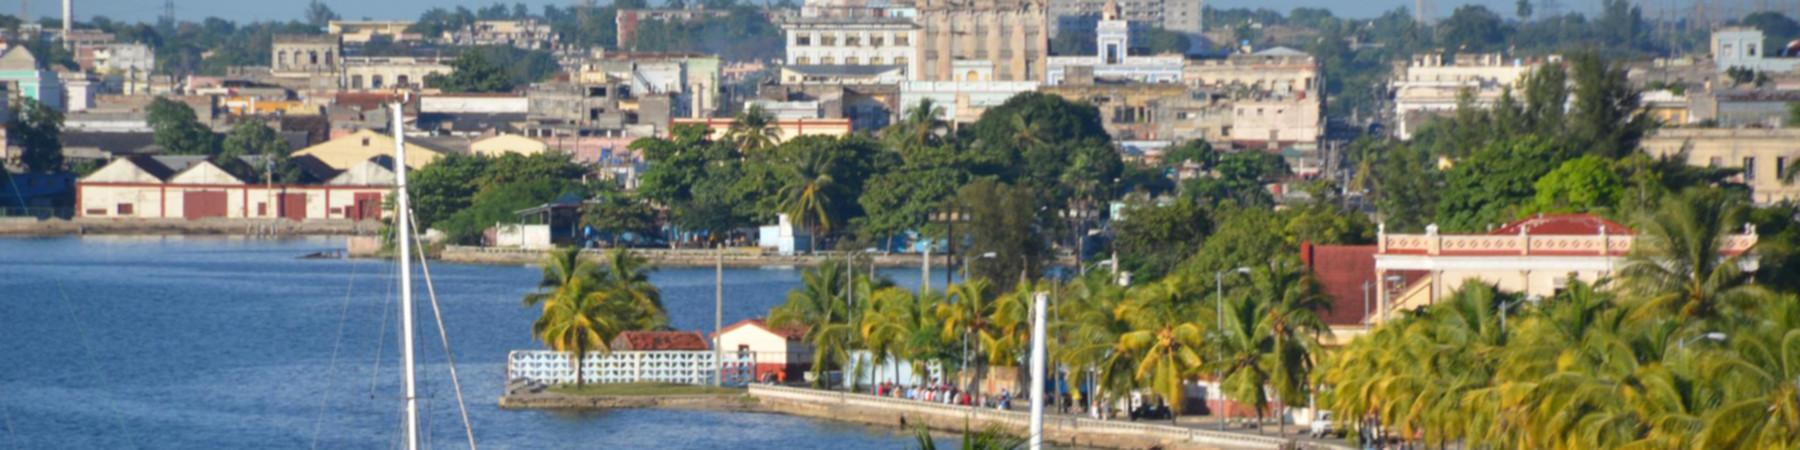 Cienfuegos Banner.jpg